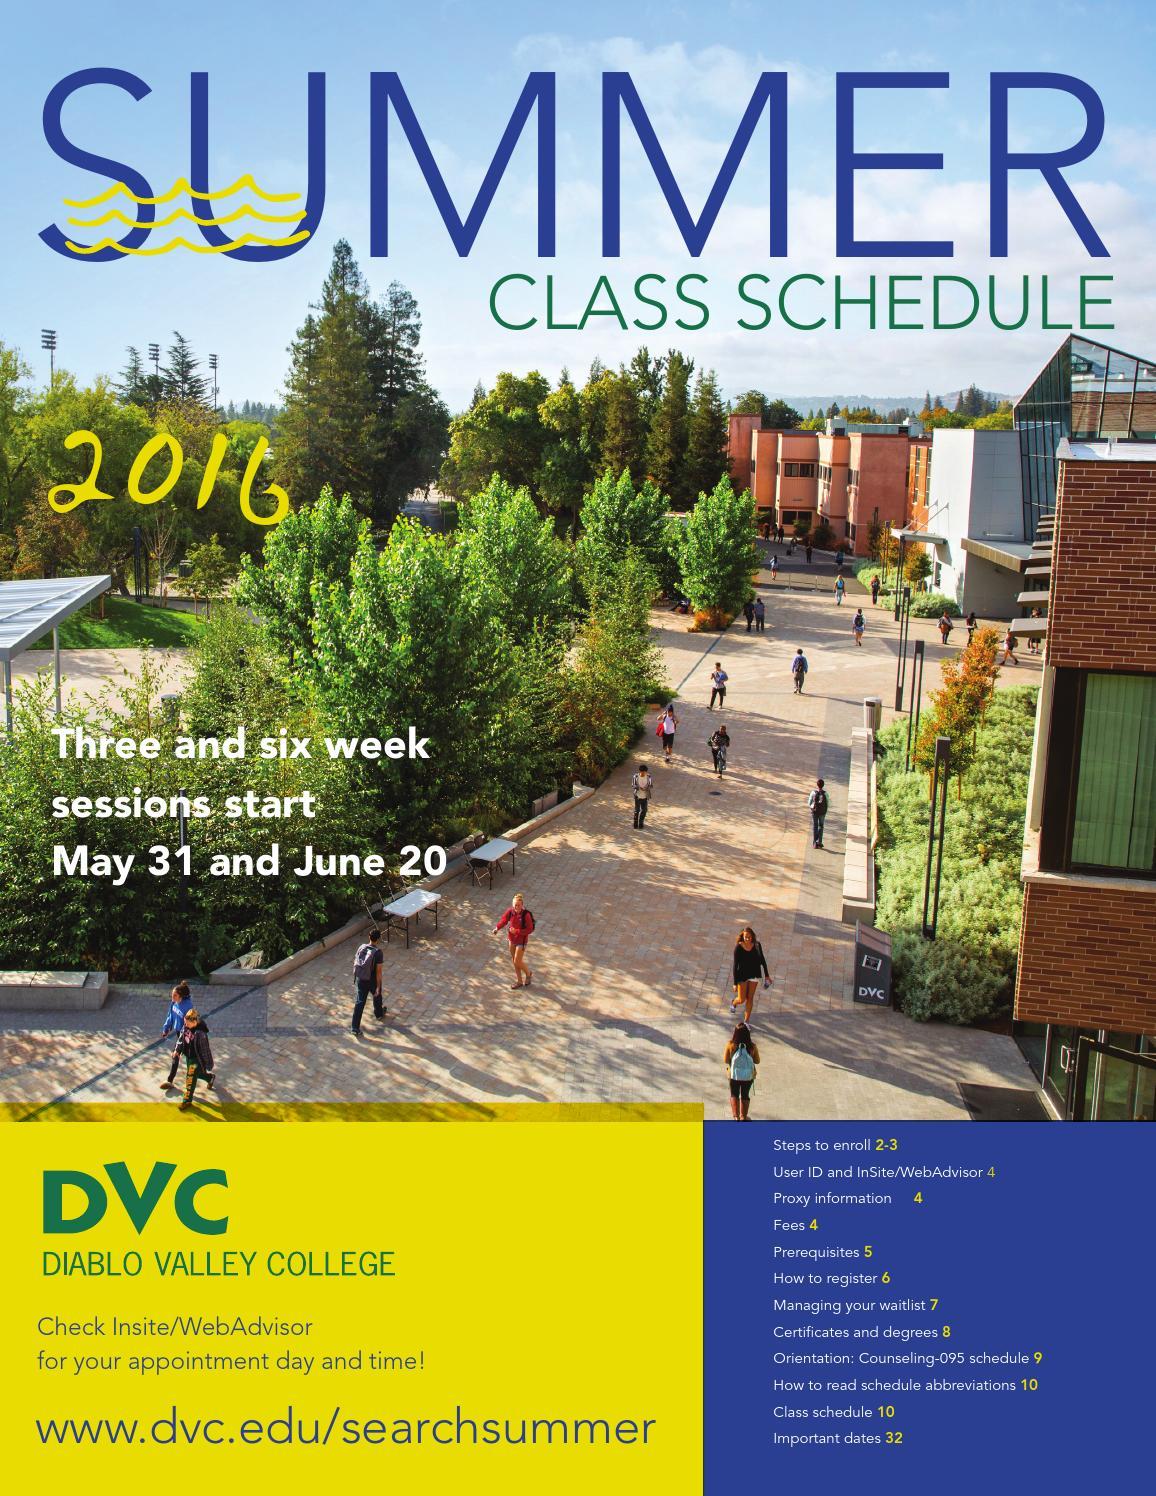 dvc summer 2016 class schedule by diablo valley college issuu